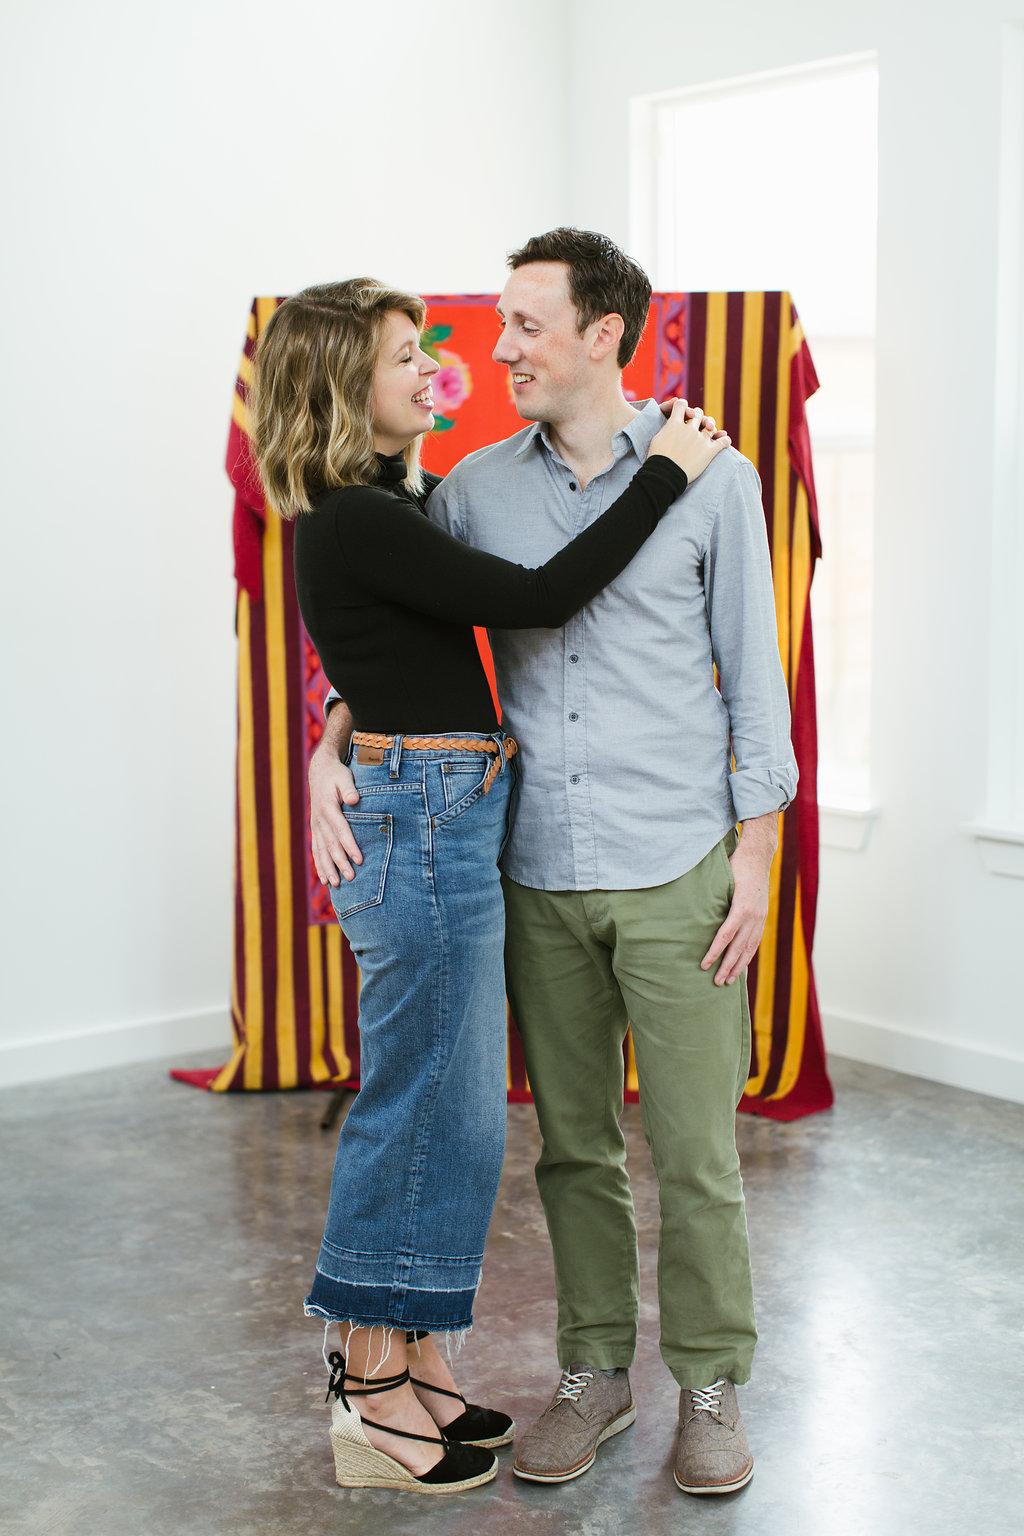 Paige-Newton-Photography-Couple-Studio-Session-Austin-Engagement-Session0007.jpg